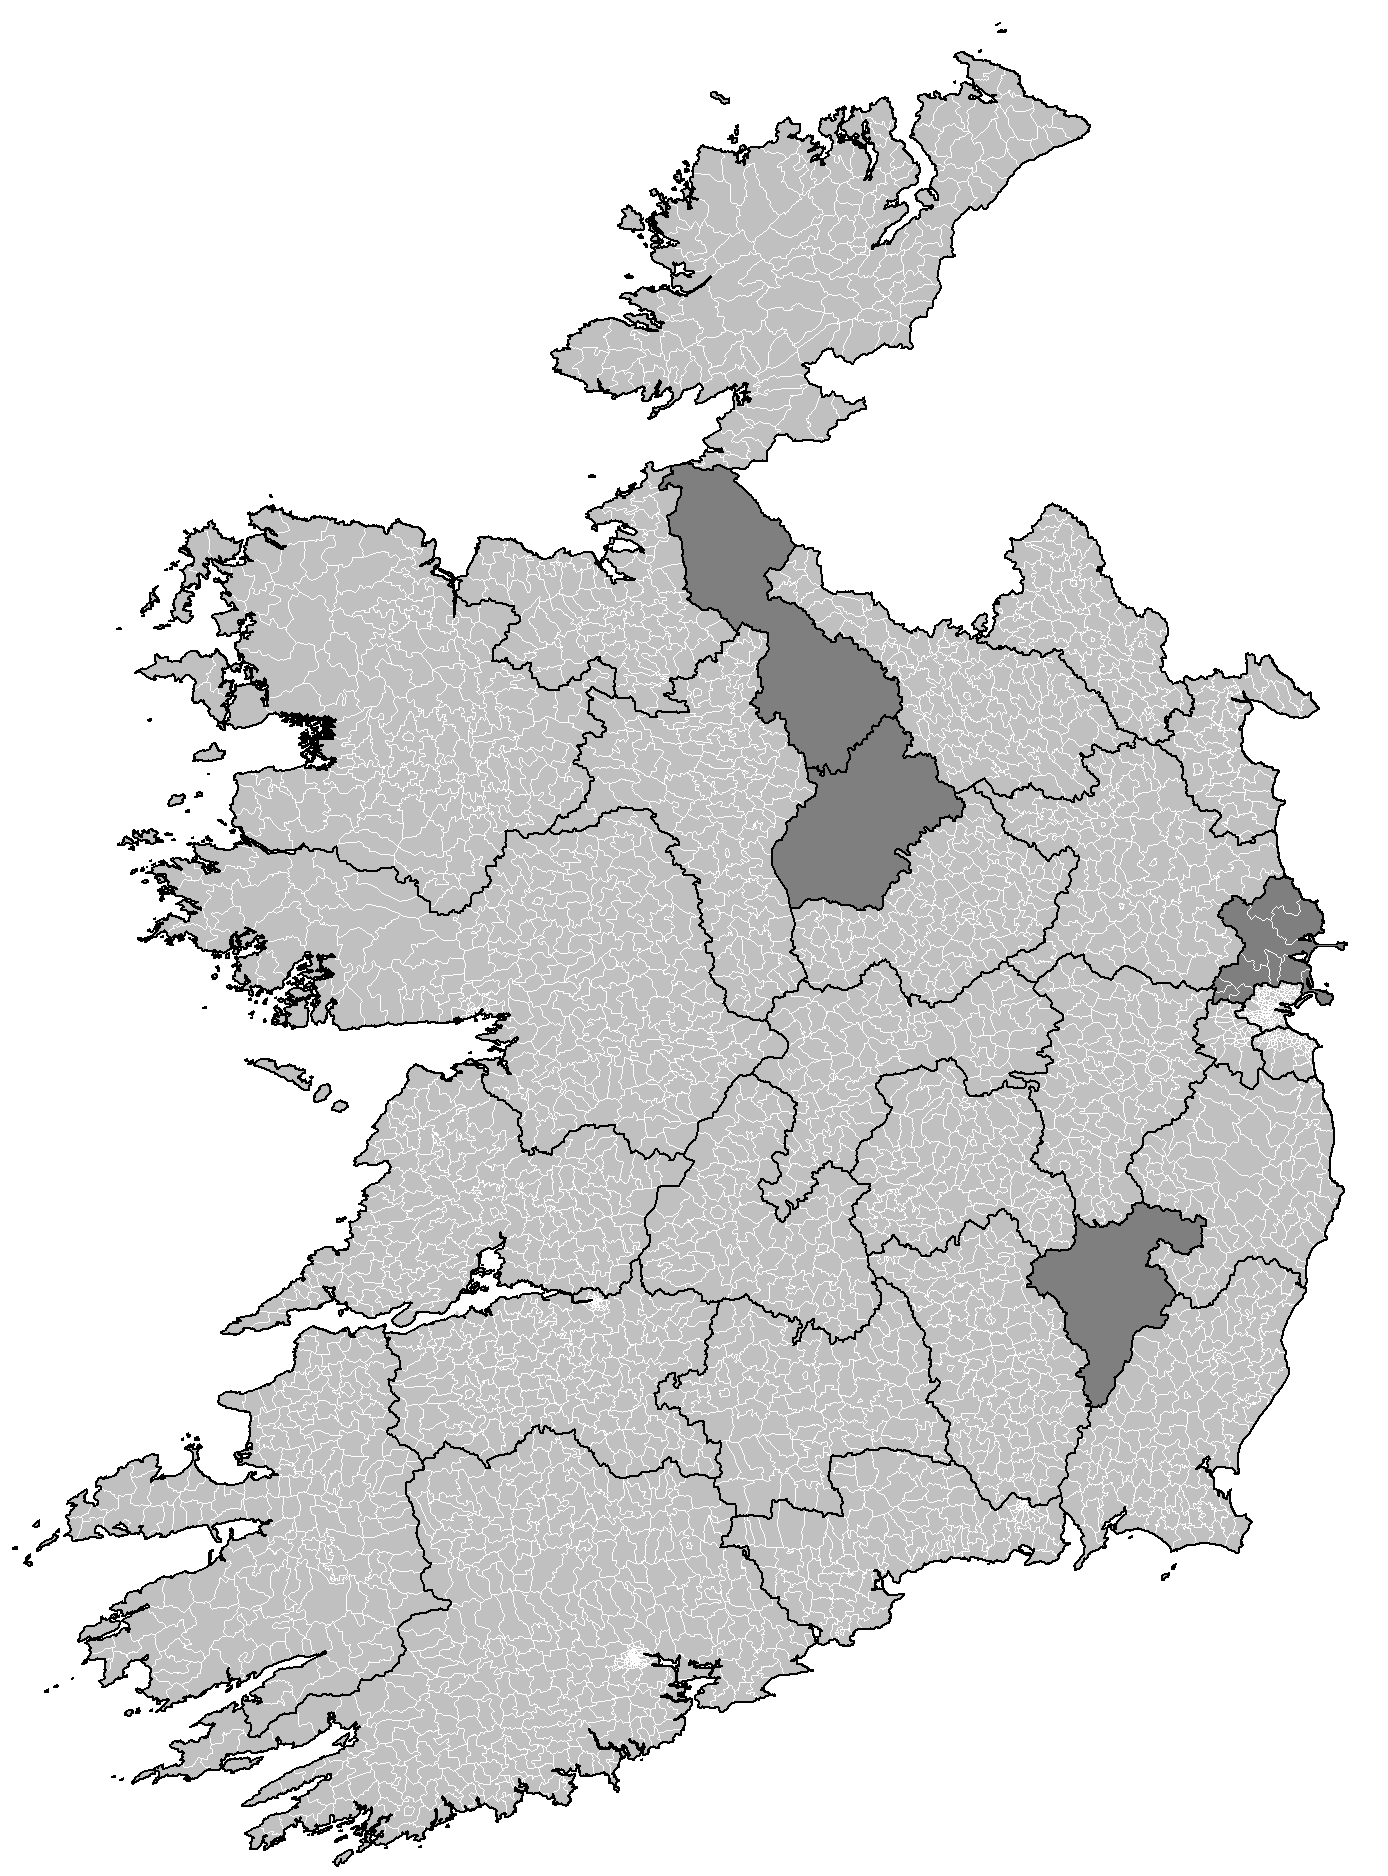 https://i.ibb.co/bJYYWb3/160-Irish-constituencies.png